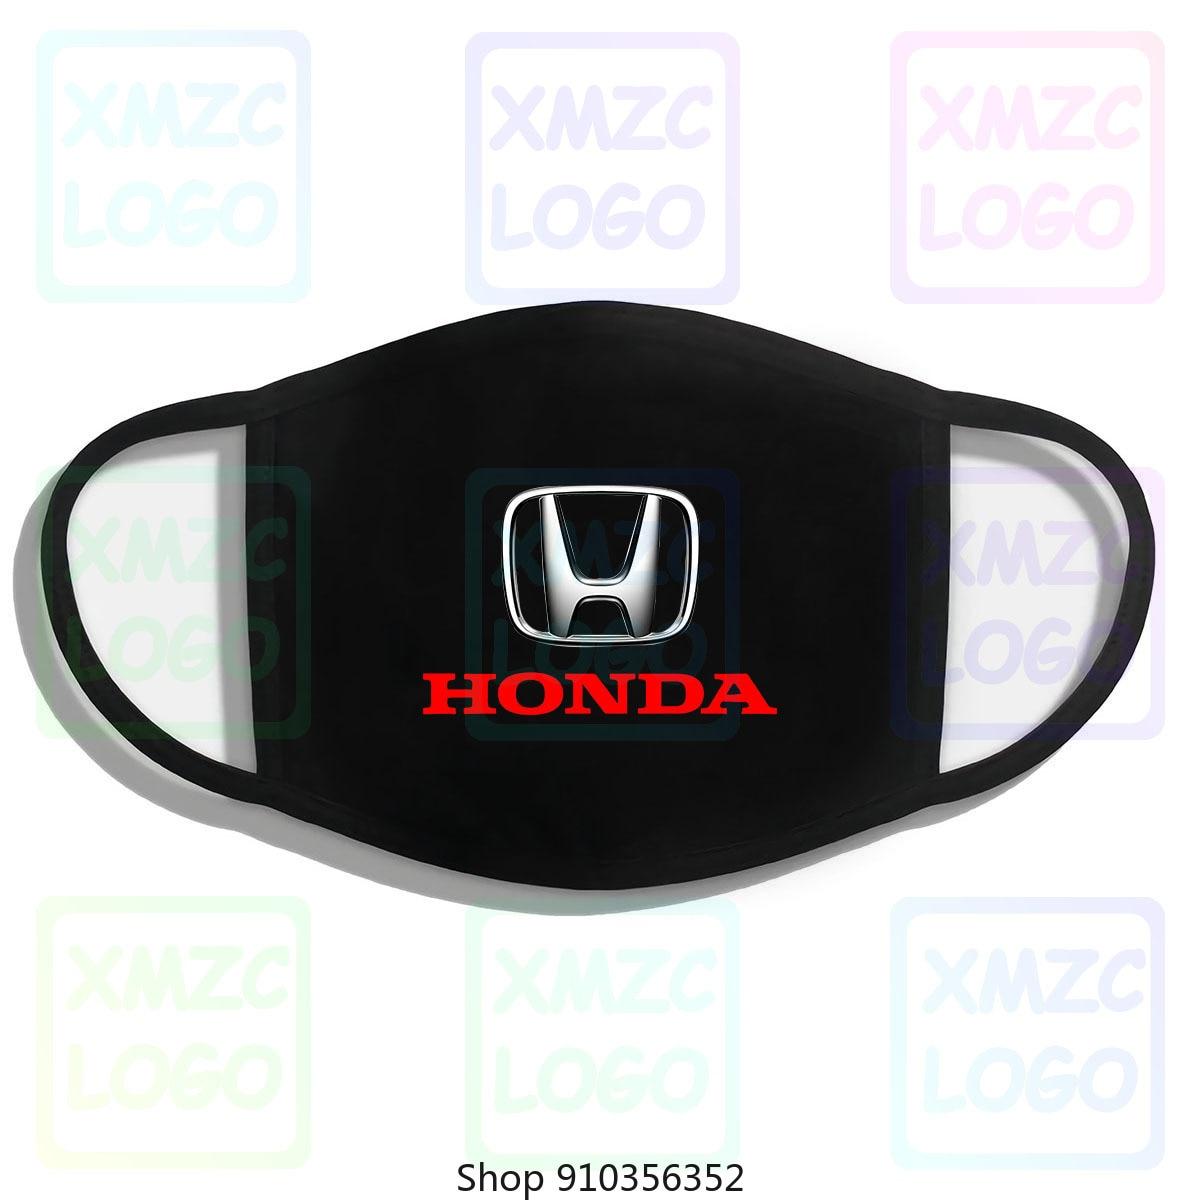 Honda Logo Cars Hoodies SweaOutdoors Black New Headband scarf Mask Bandana Women Men